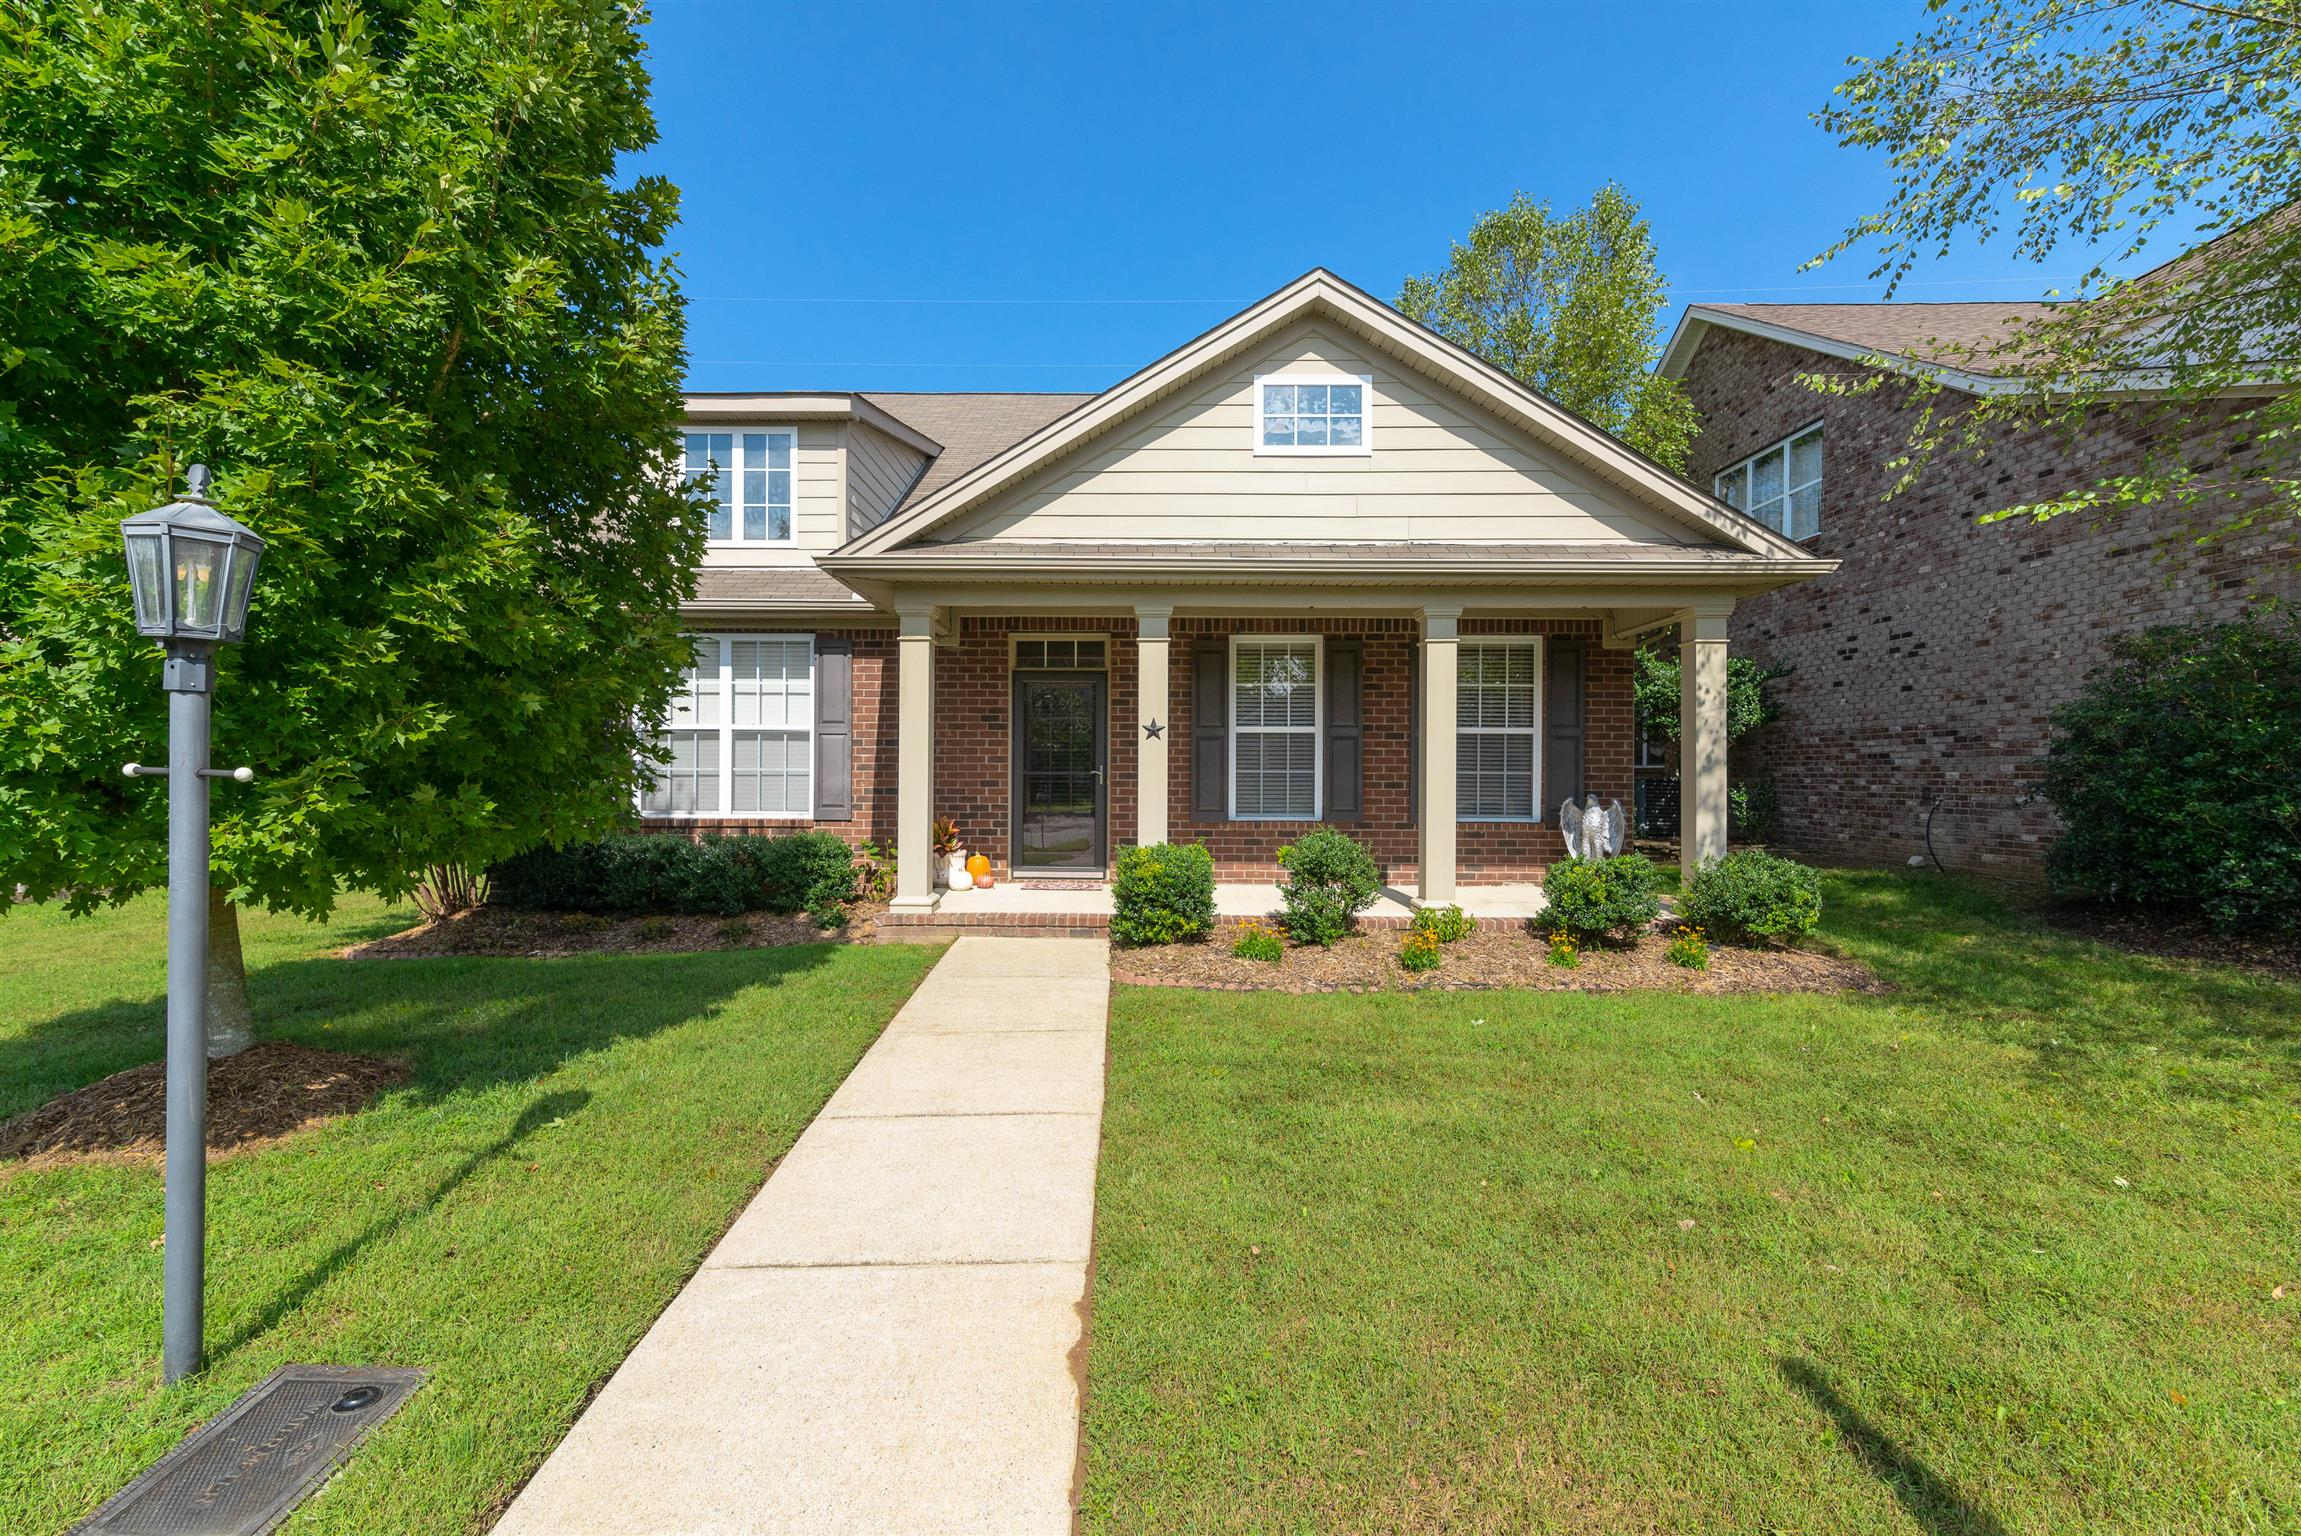 5244 New John Hagar Rd, Hermitage, TN 37076 - Hermitage, TN real estate listing